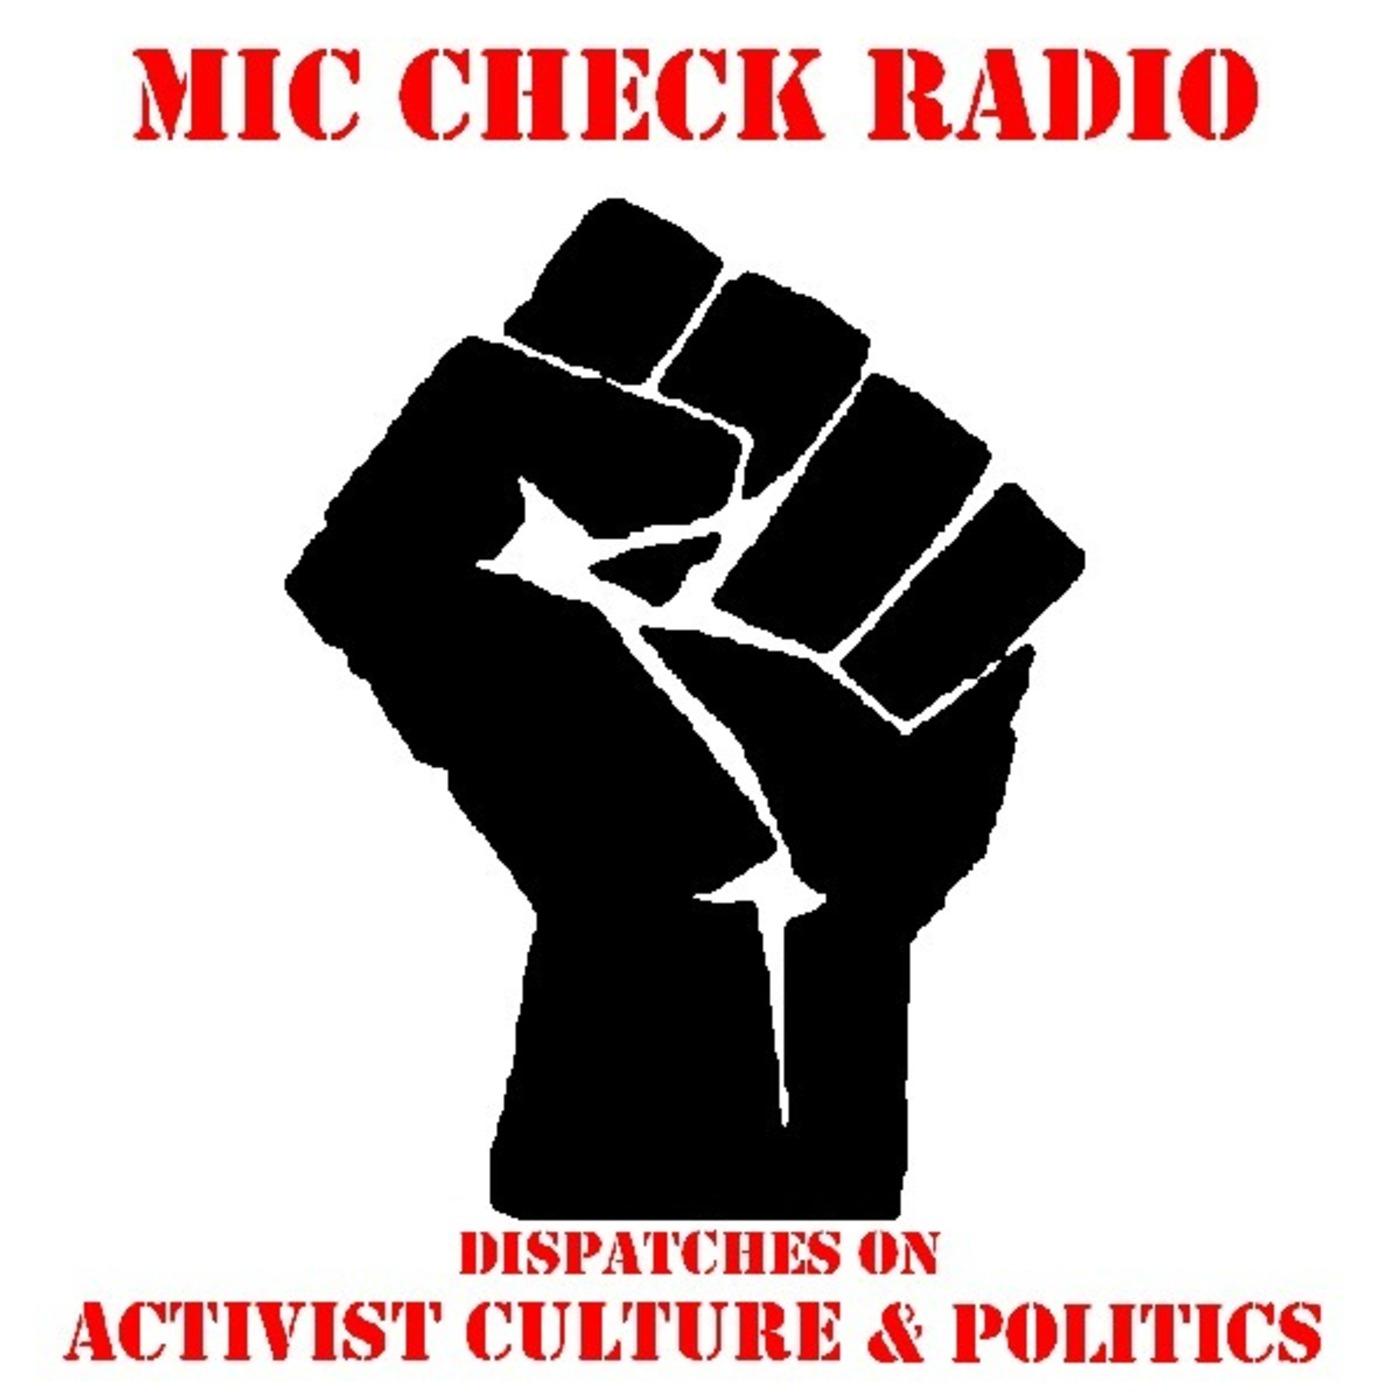 Mic Check Radio: Episode II : Finem Puer Abusum